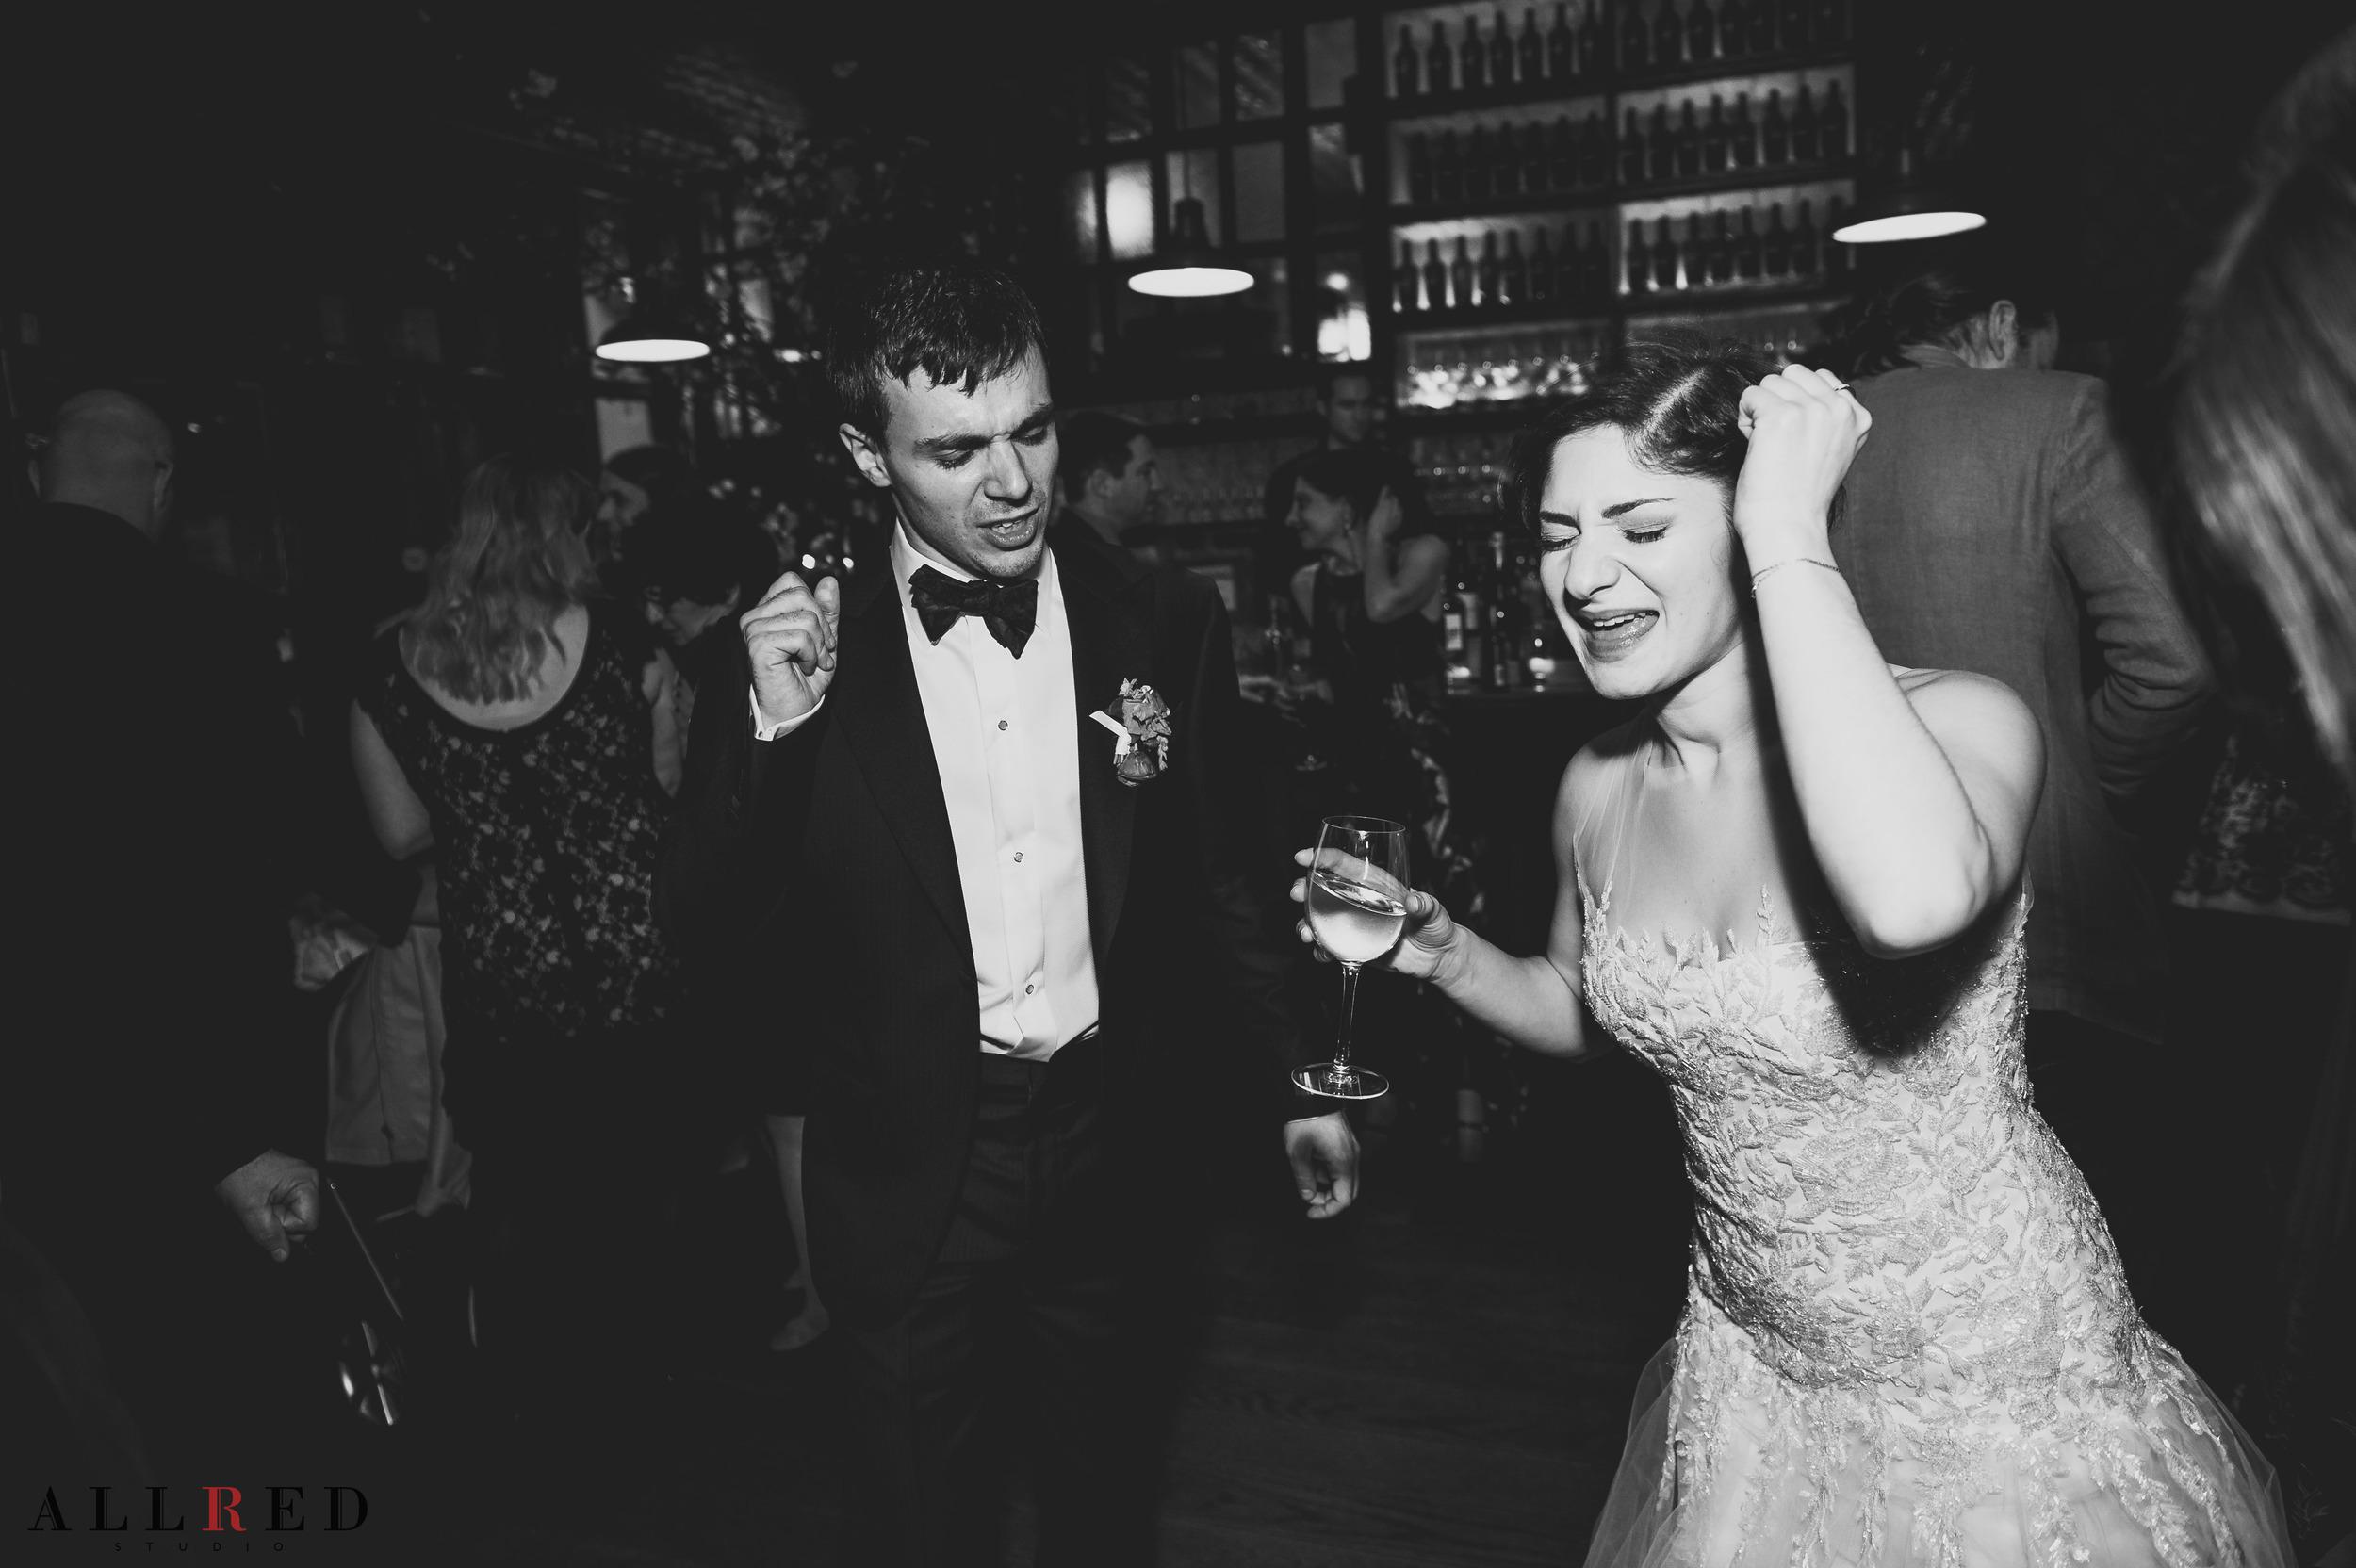 Wedding-Brooklyn-winery-allred-studio-new-york-photographer-new-jersey-hudson-valley-02406.jpg